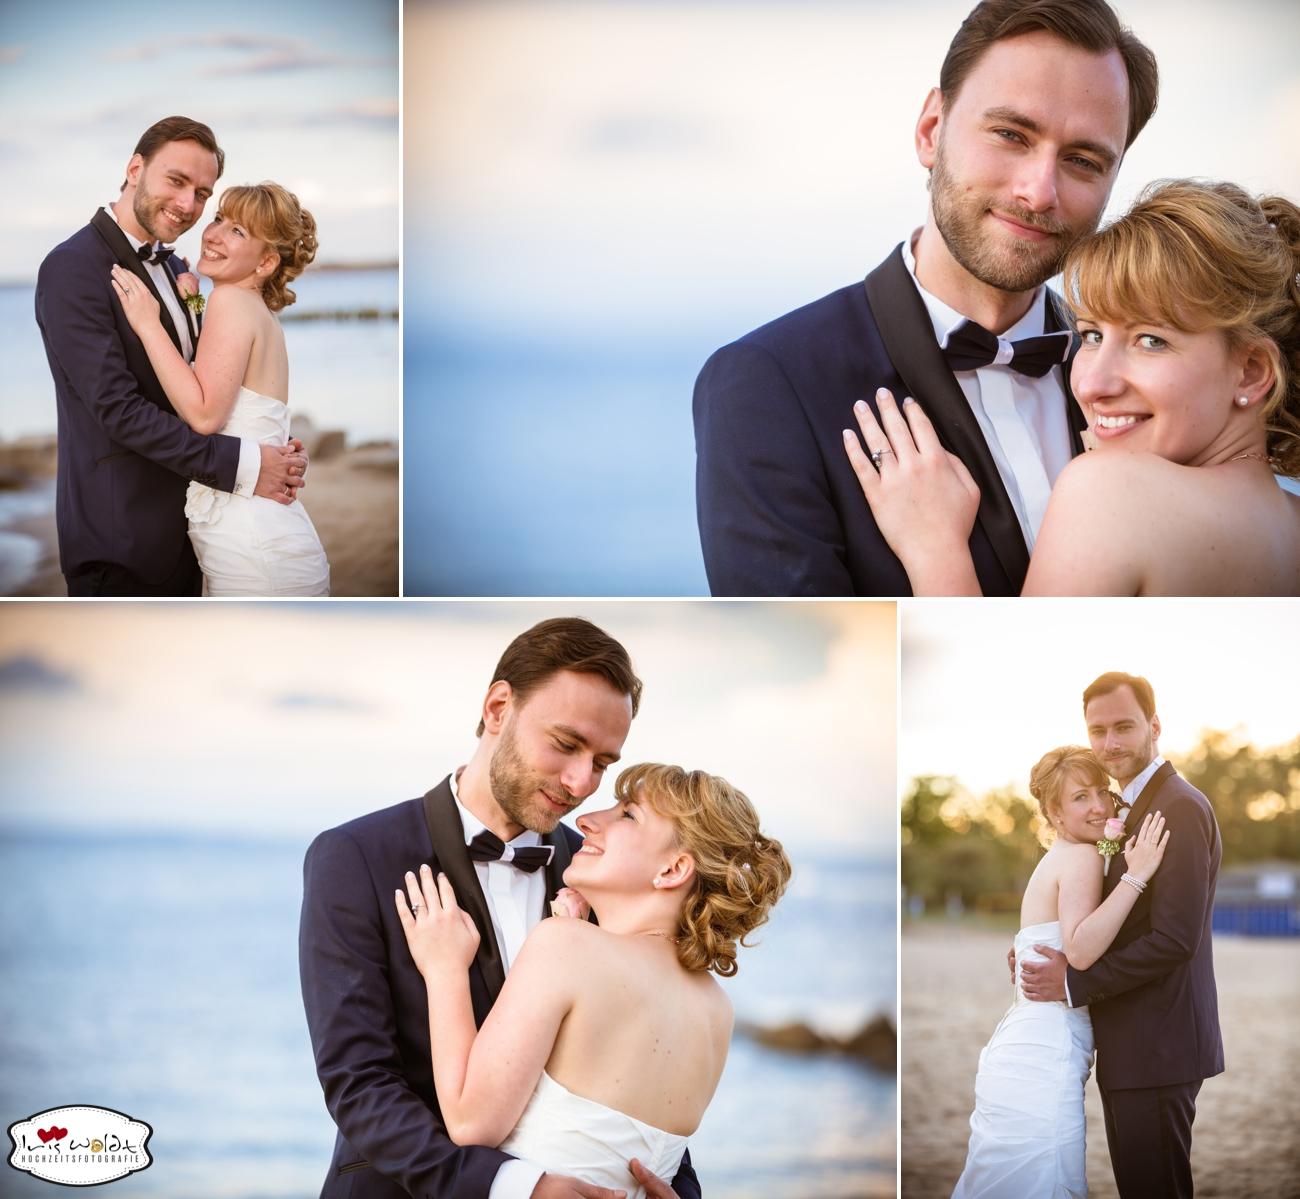 Heiraten in Uekermuende 36